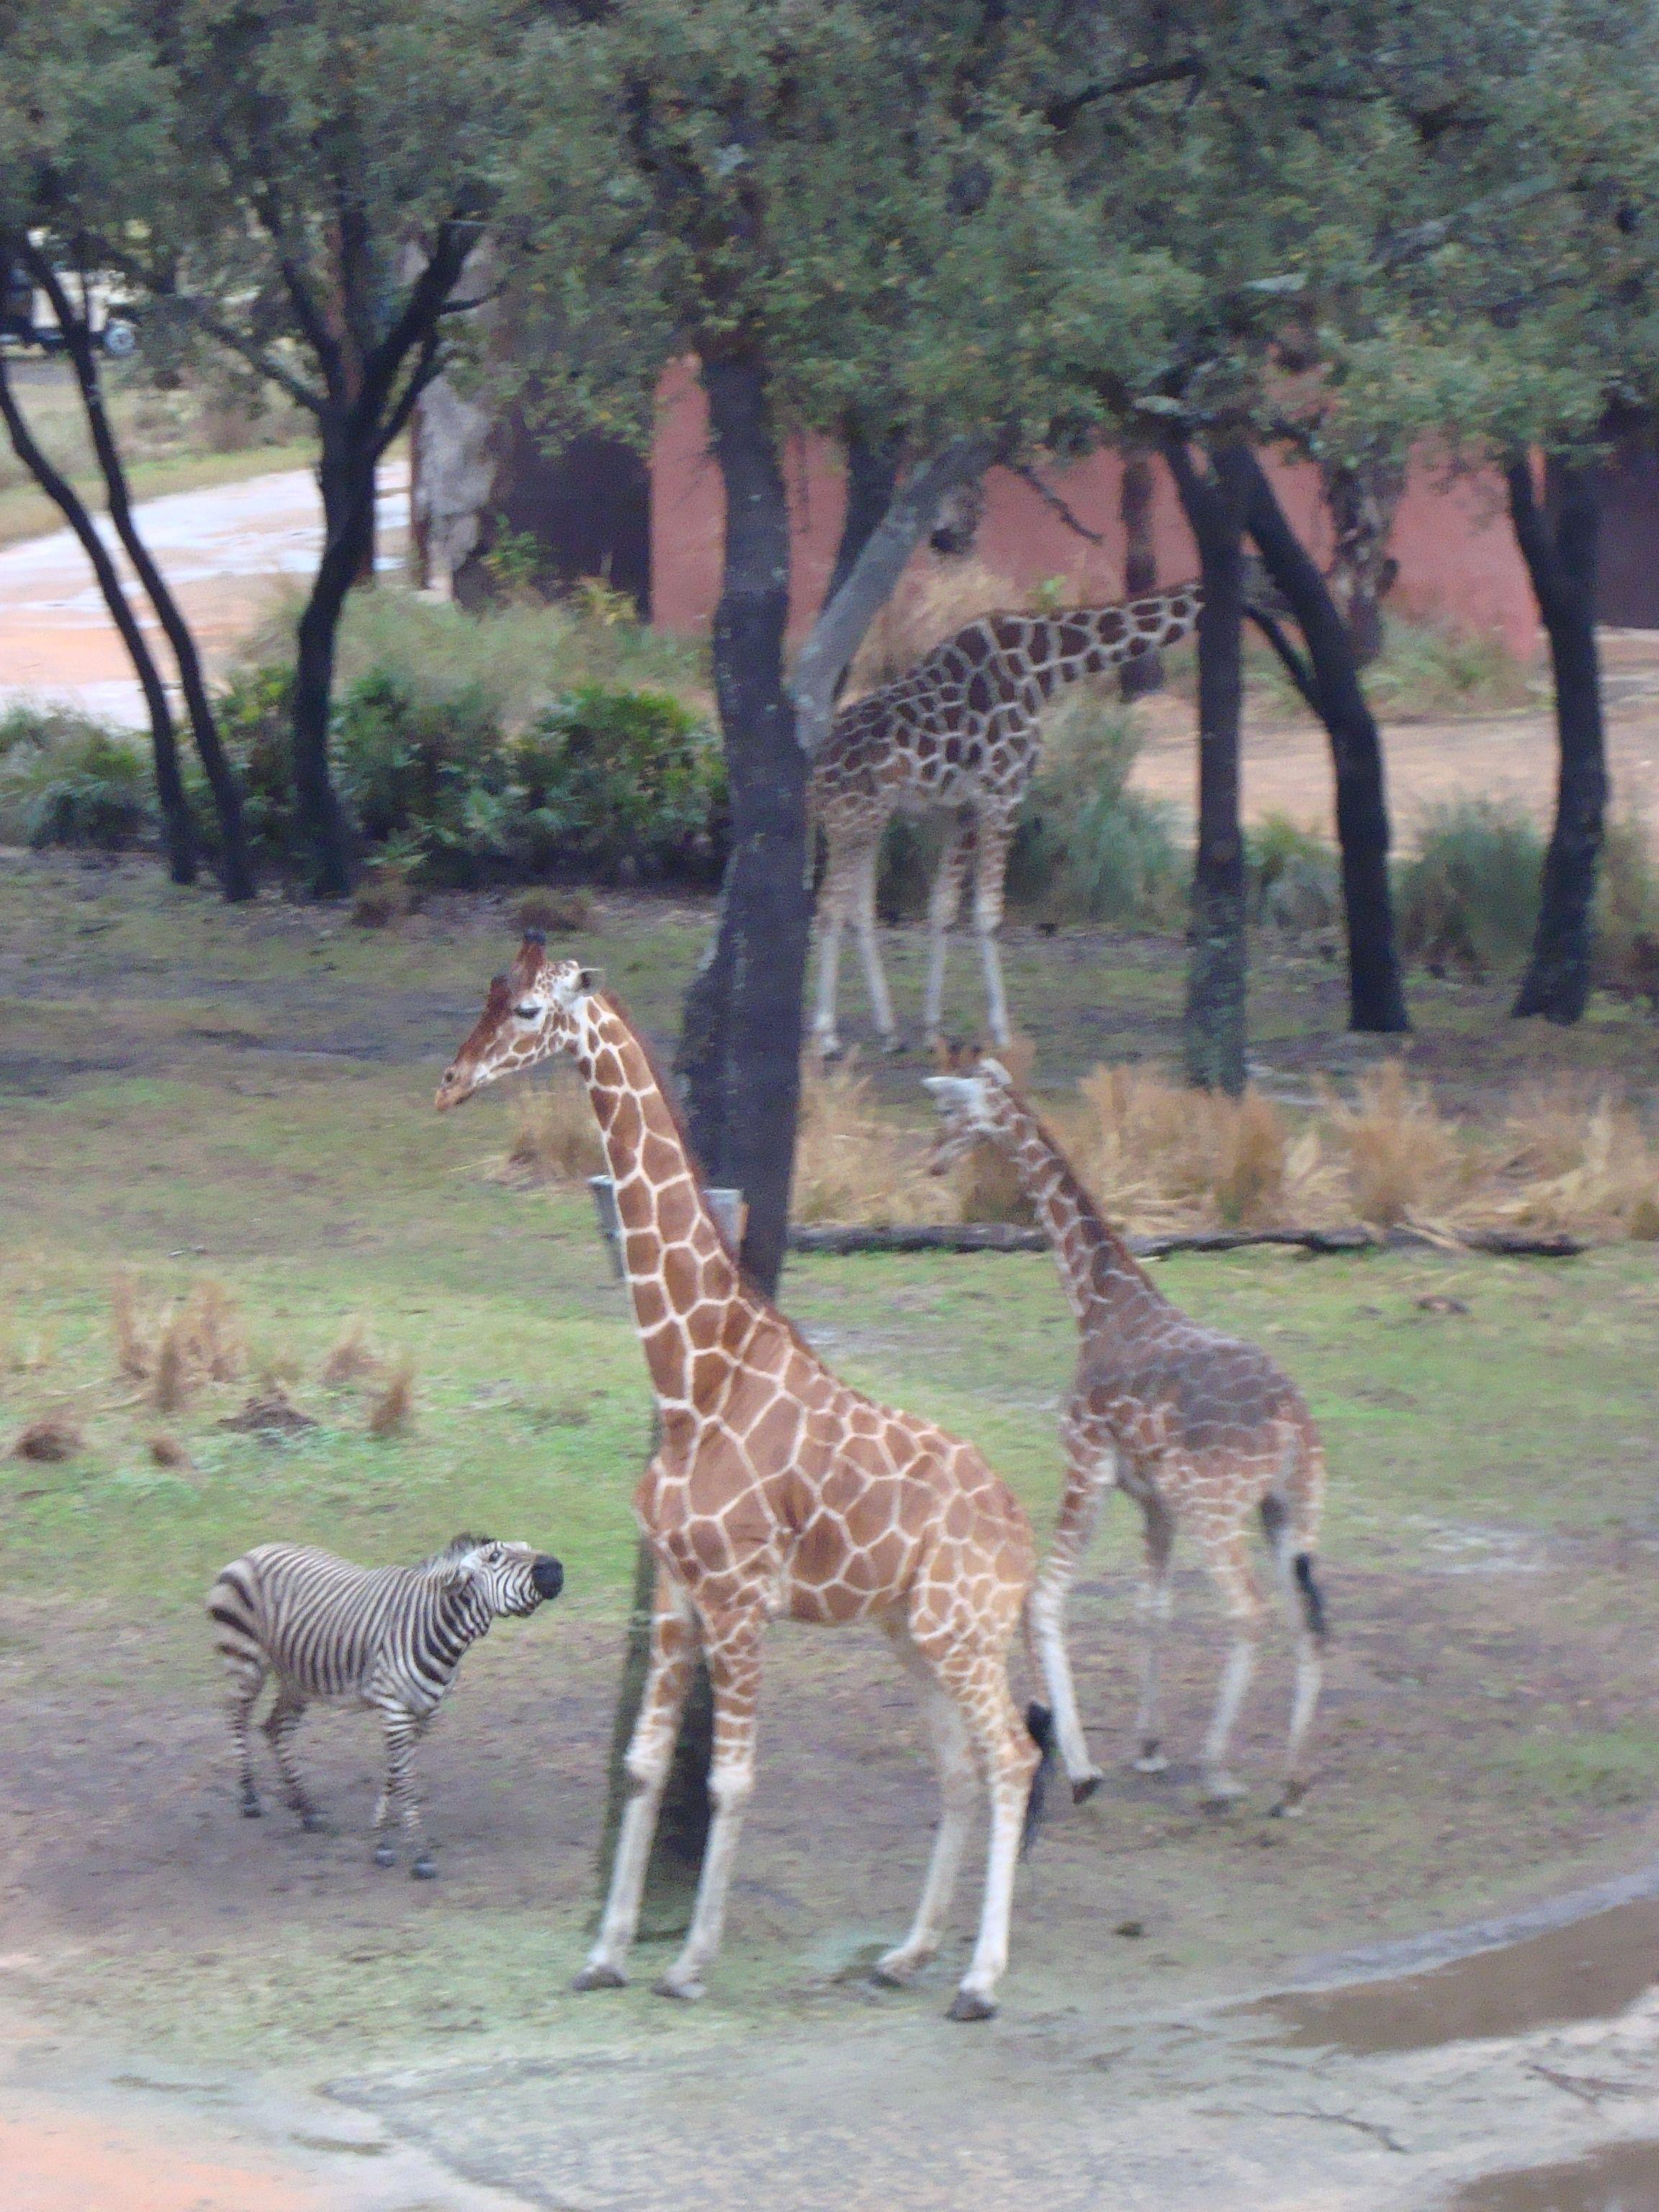 Giraffes And Zebra Zebra Looks A Little Frustrated